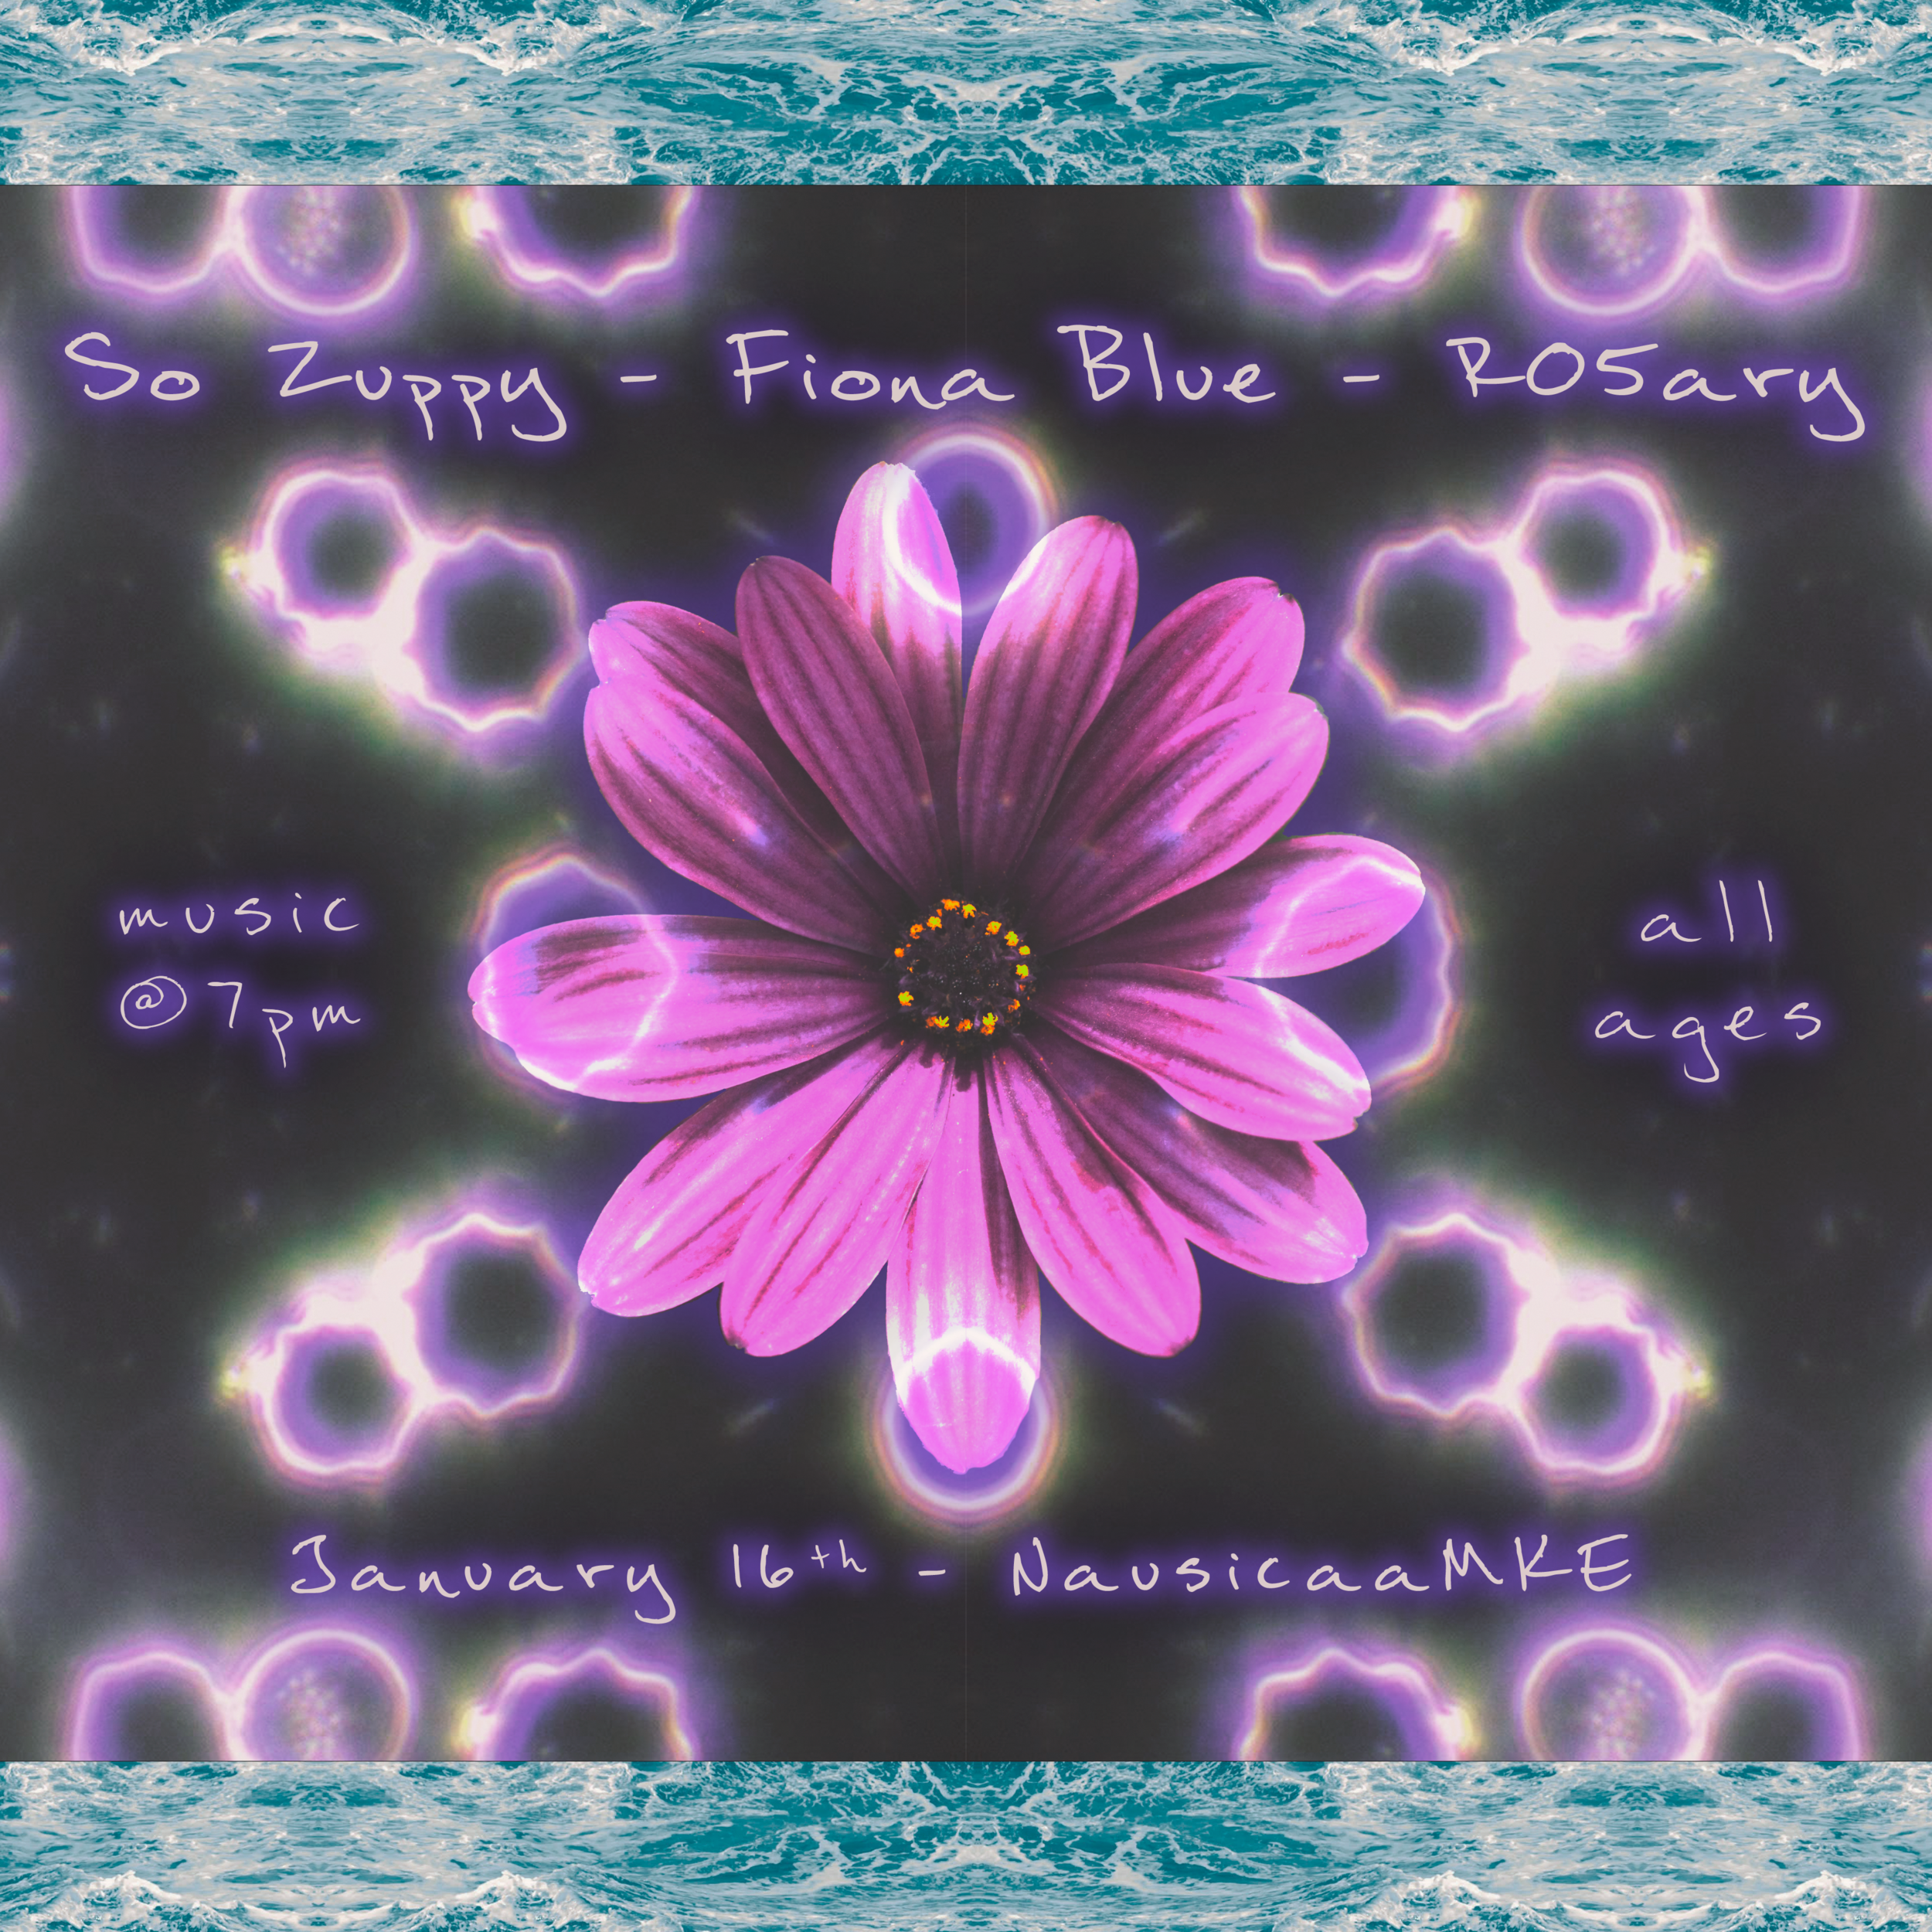 so zuppy-fiona blue-r05ary_v2.png